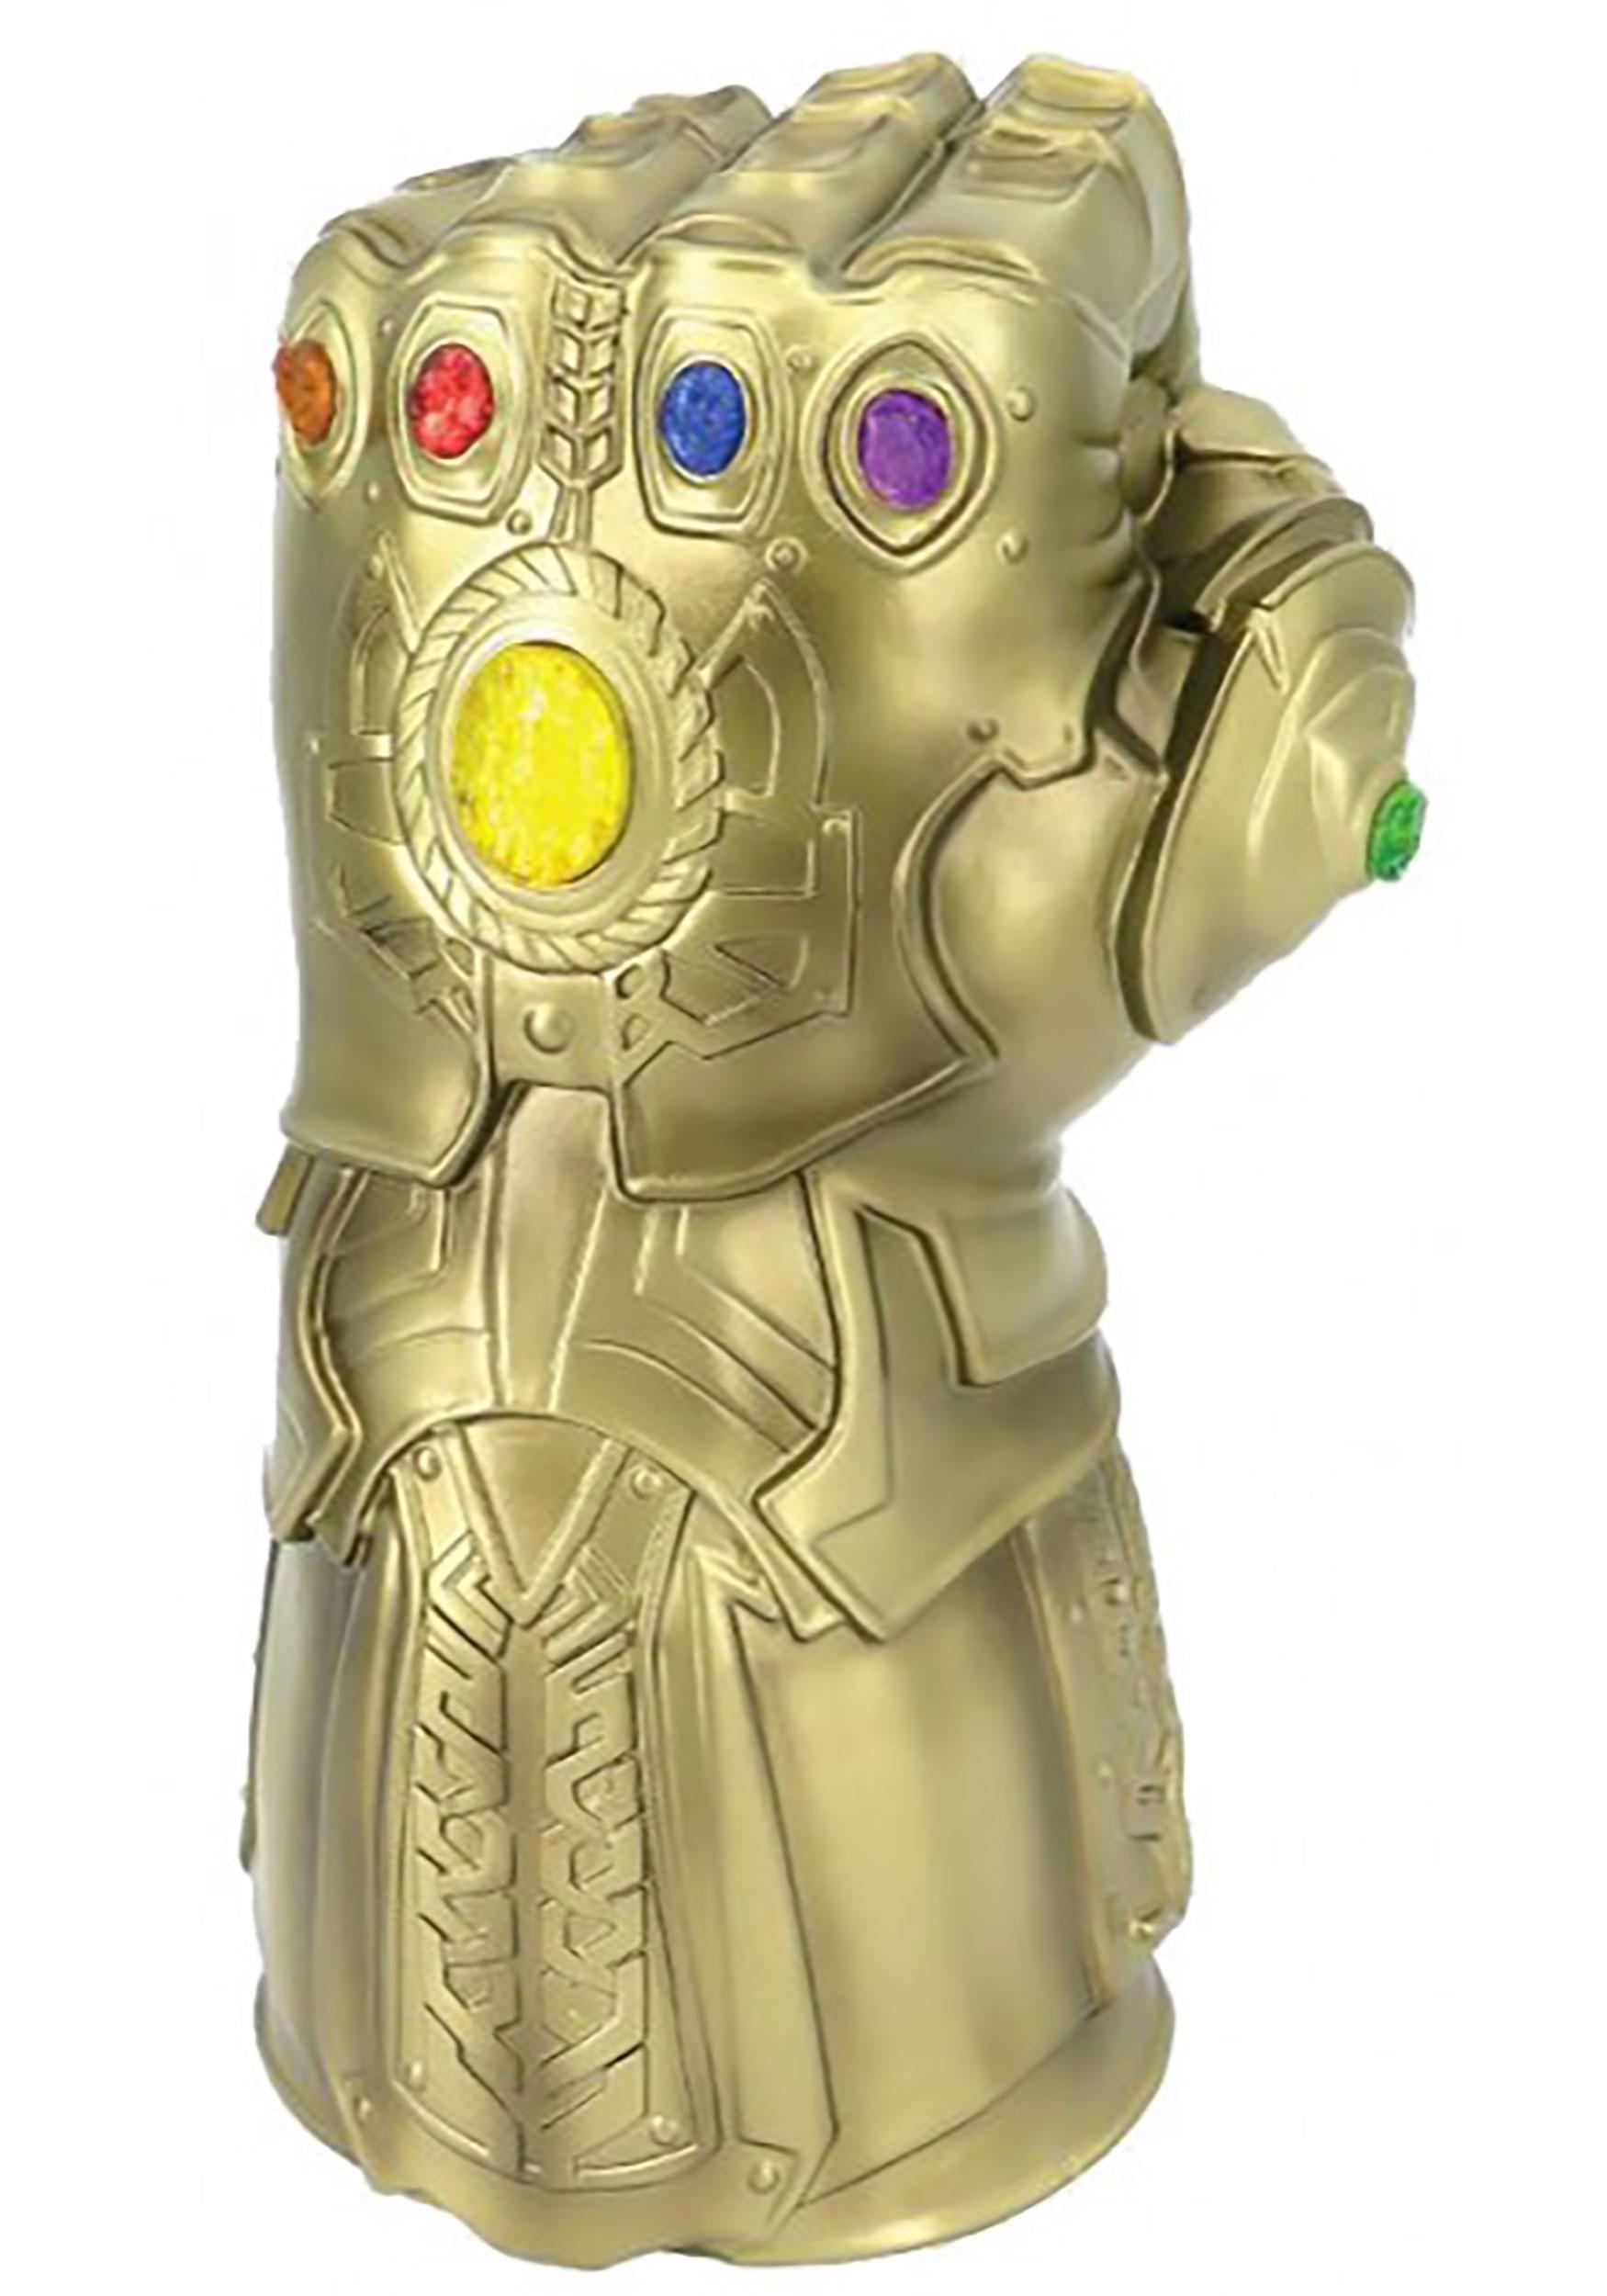 Marvel Thanos Infinity War Gauntlet Coin Bank